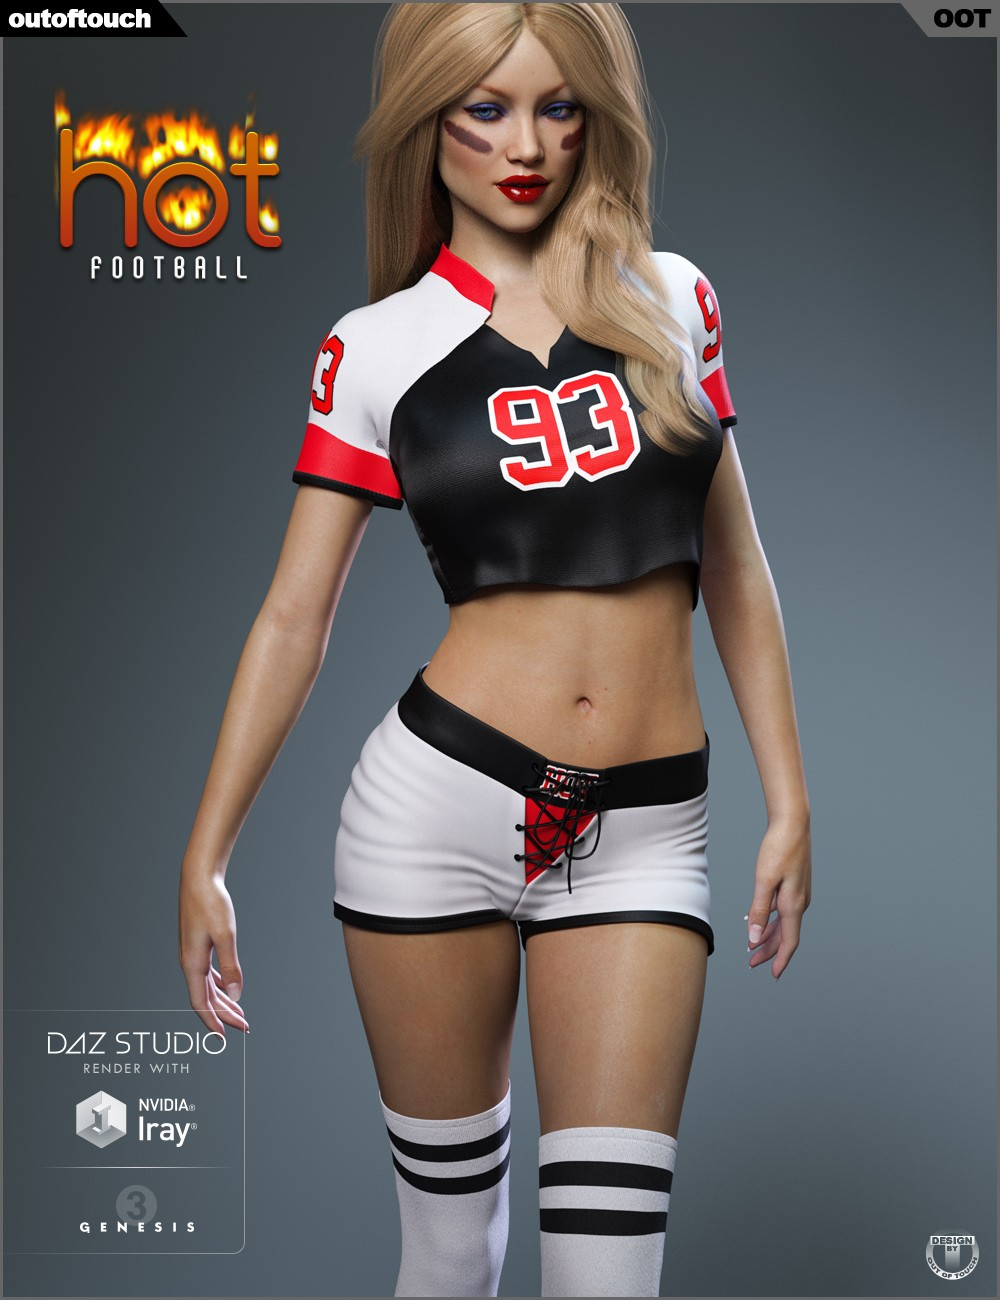 Download Daz Studio 3 For Free Daz 3D - Hot Football -4618